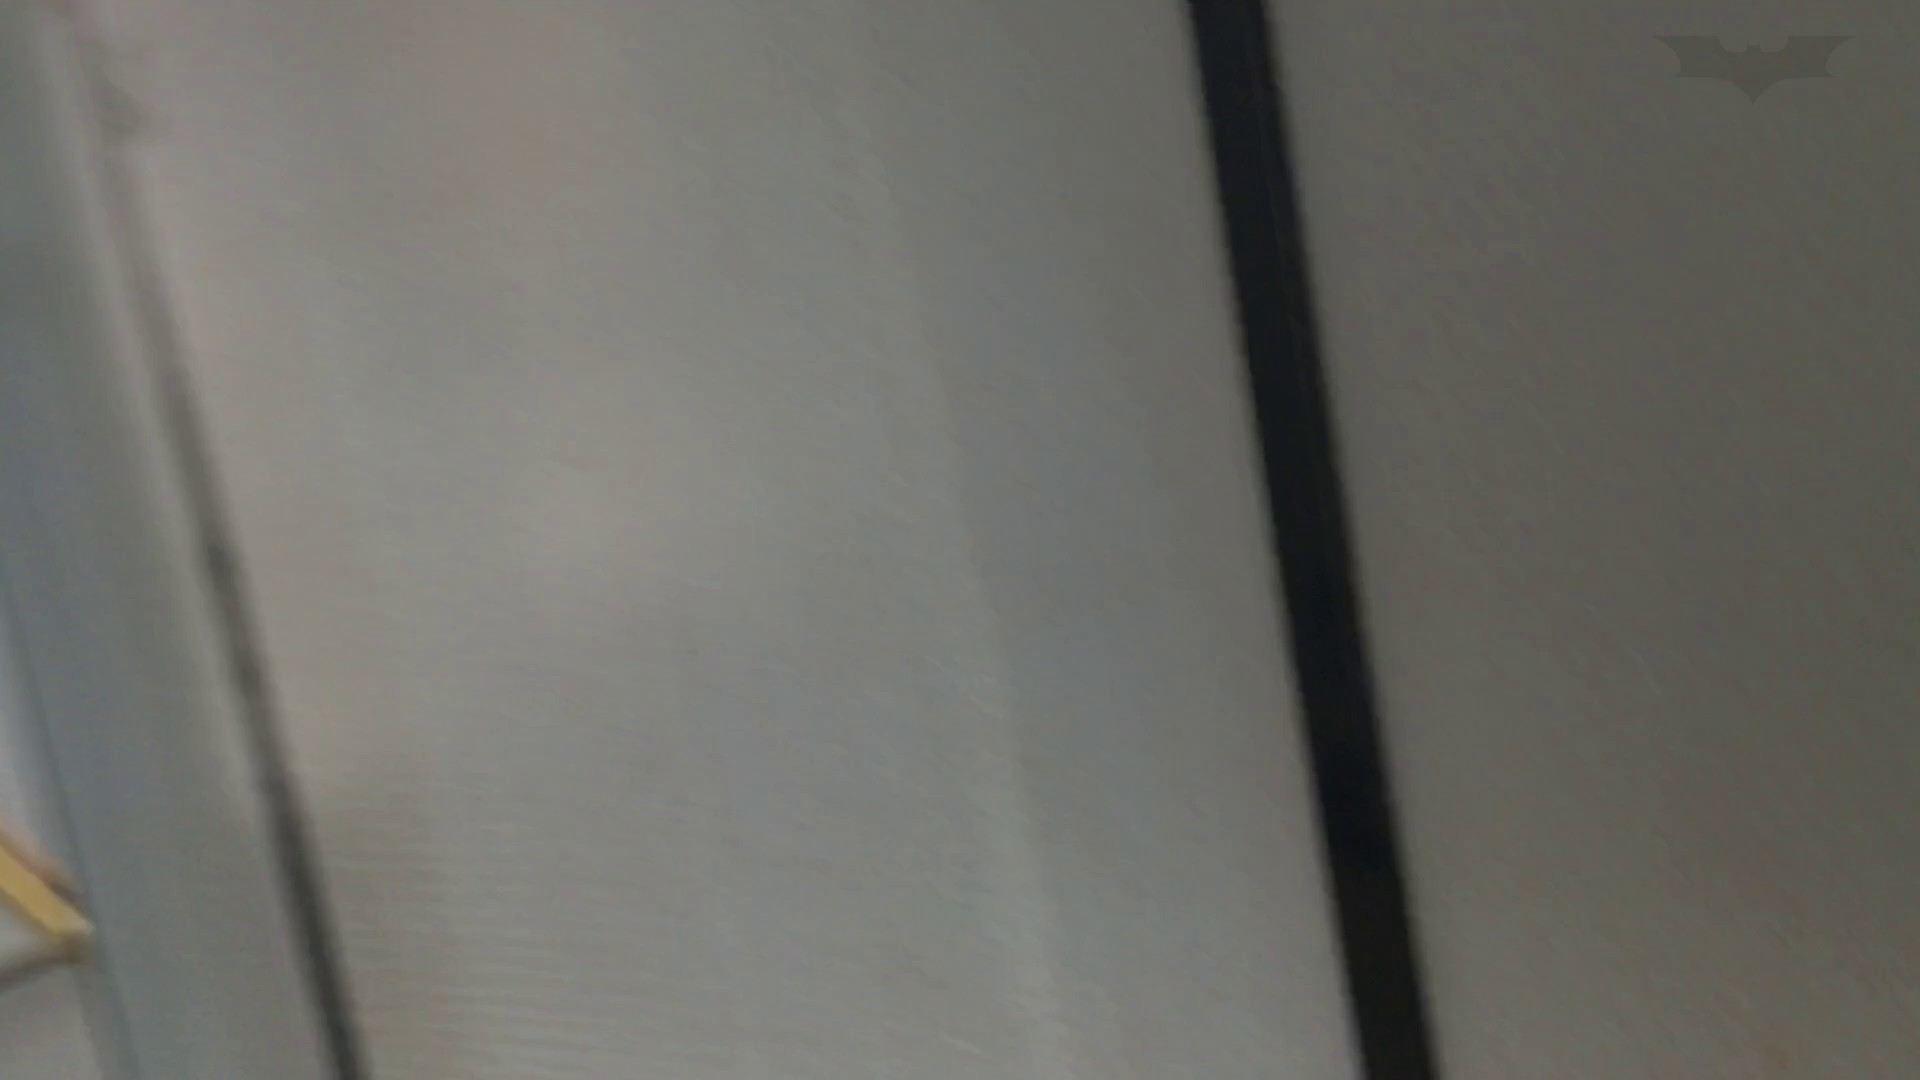 芸術大学ガチ潜入盗撮 JD盗撮 美女の洗面所の秘密 Vol.82 高画質 戯れ無修正画像 73画像 32